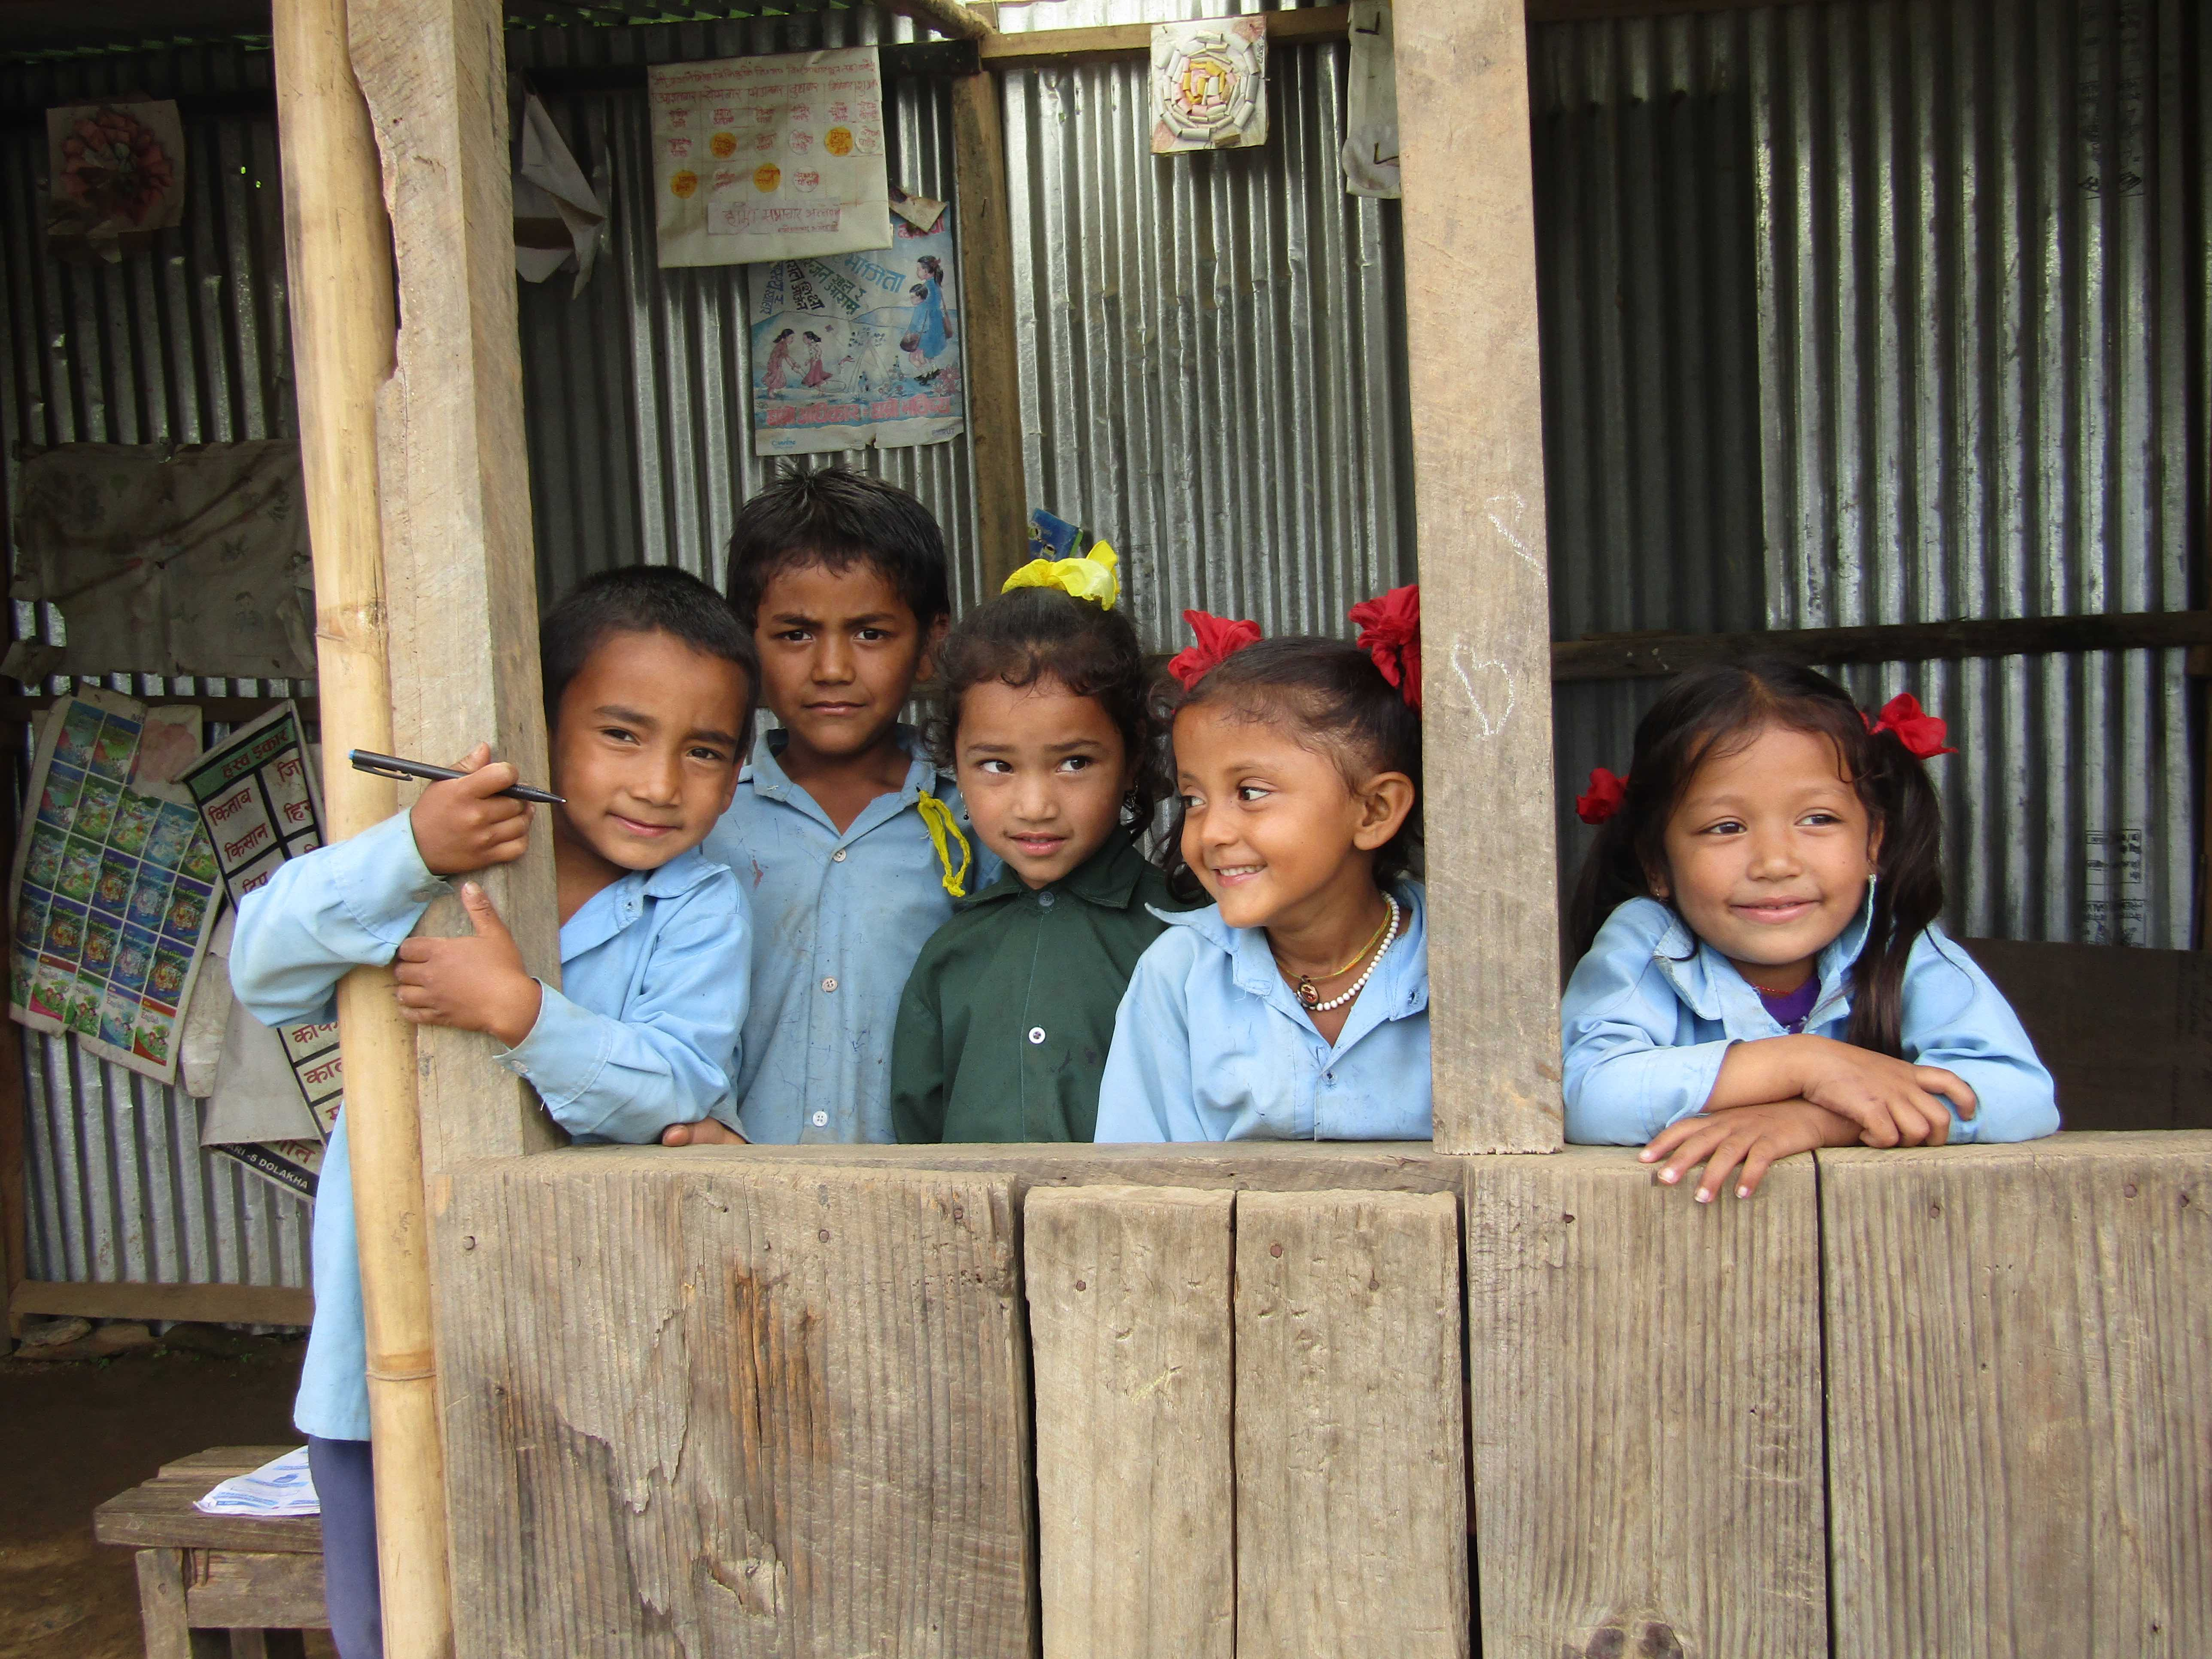 Children at Milijuli Lower Secondary School, Sept. 2017